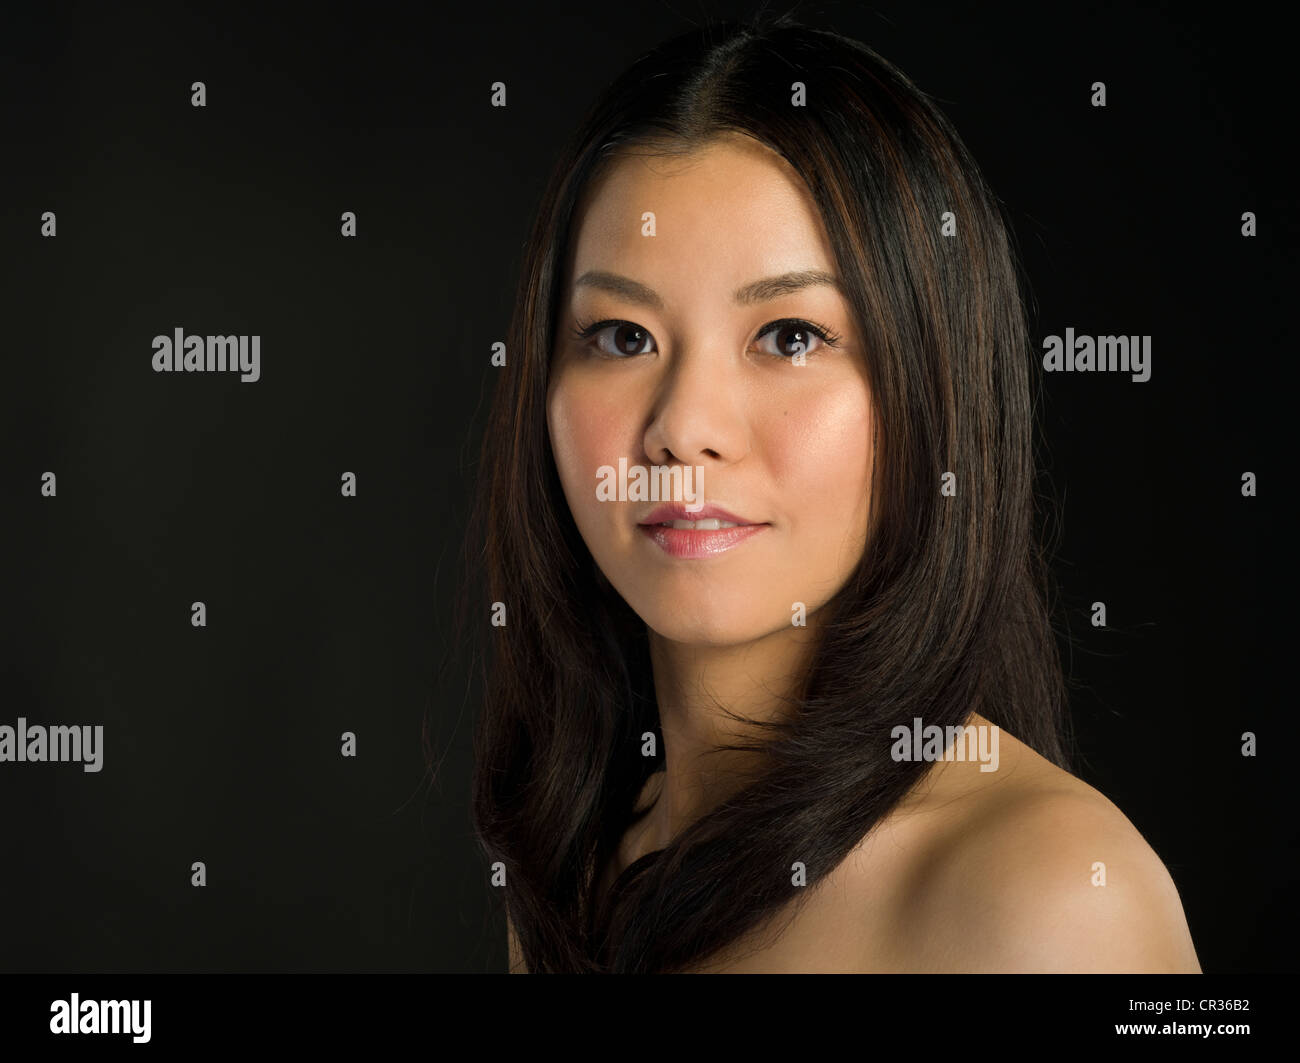 single japanese woman